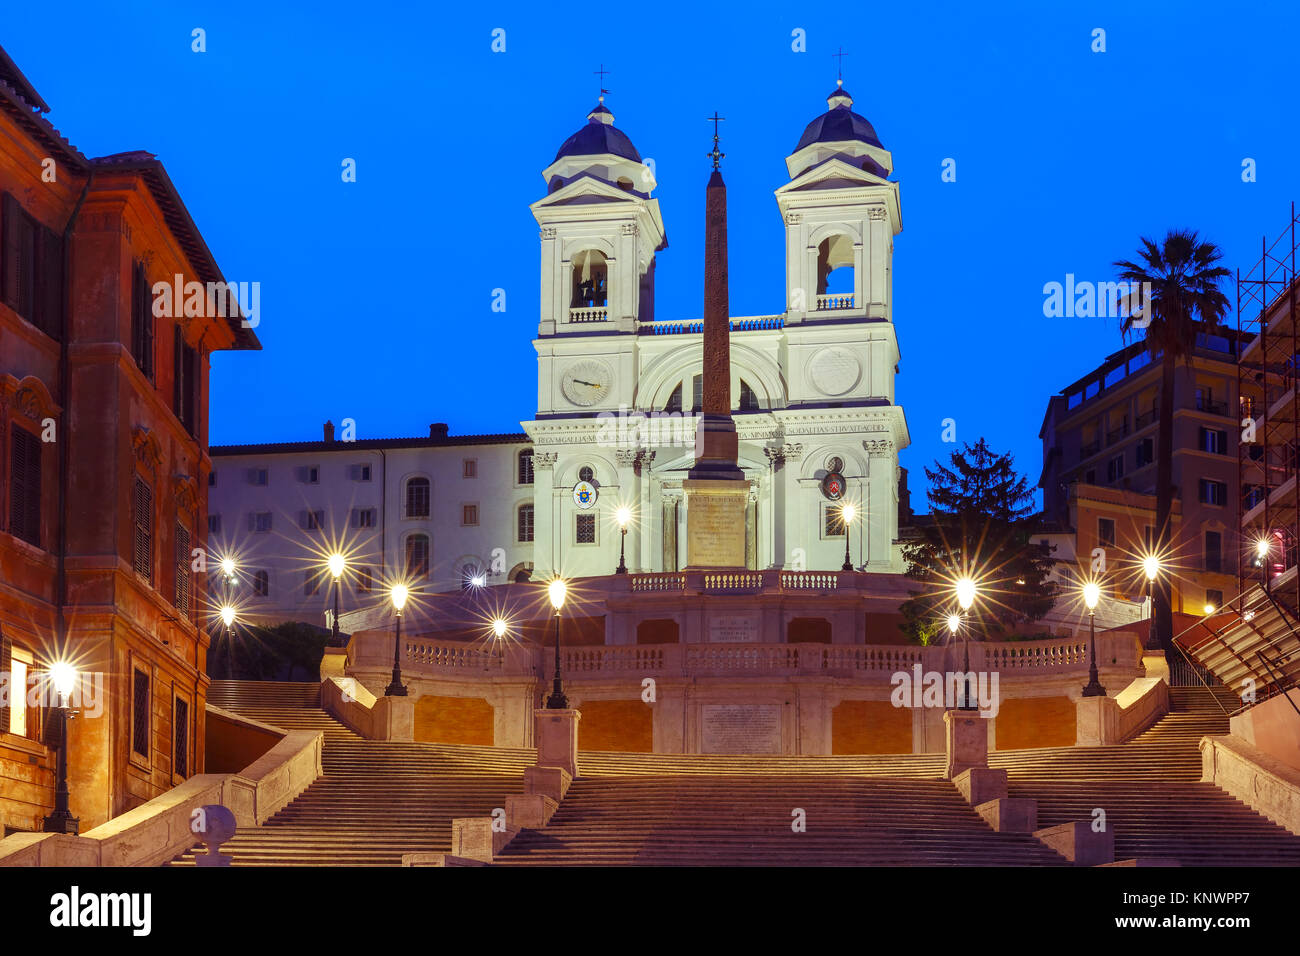 Spanish Steps at night, Rome, Italy. - Stock Image